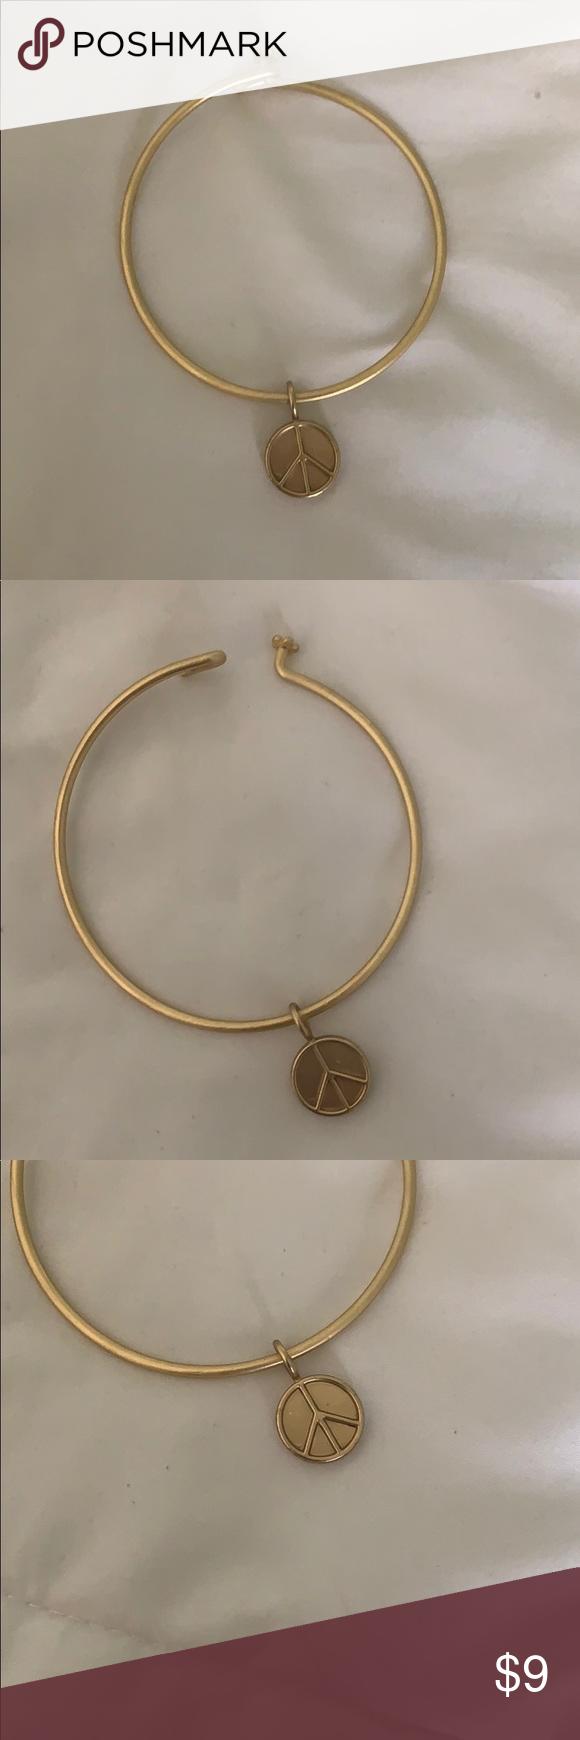 Gold Peace Sign Charm Bracelet Peace Sign Charm Gold Bracelet Charm Bracelet